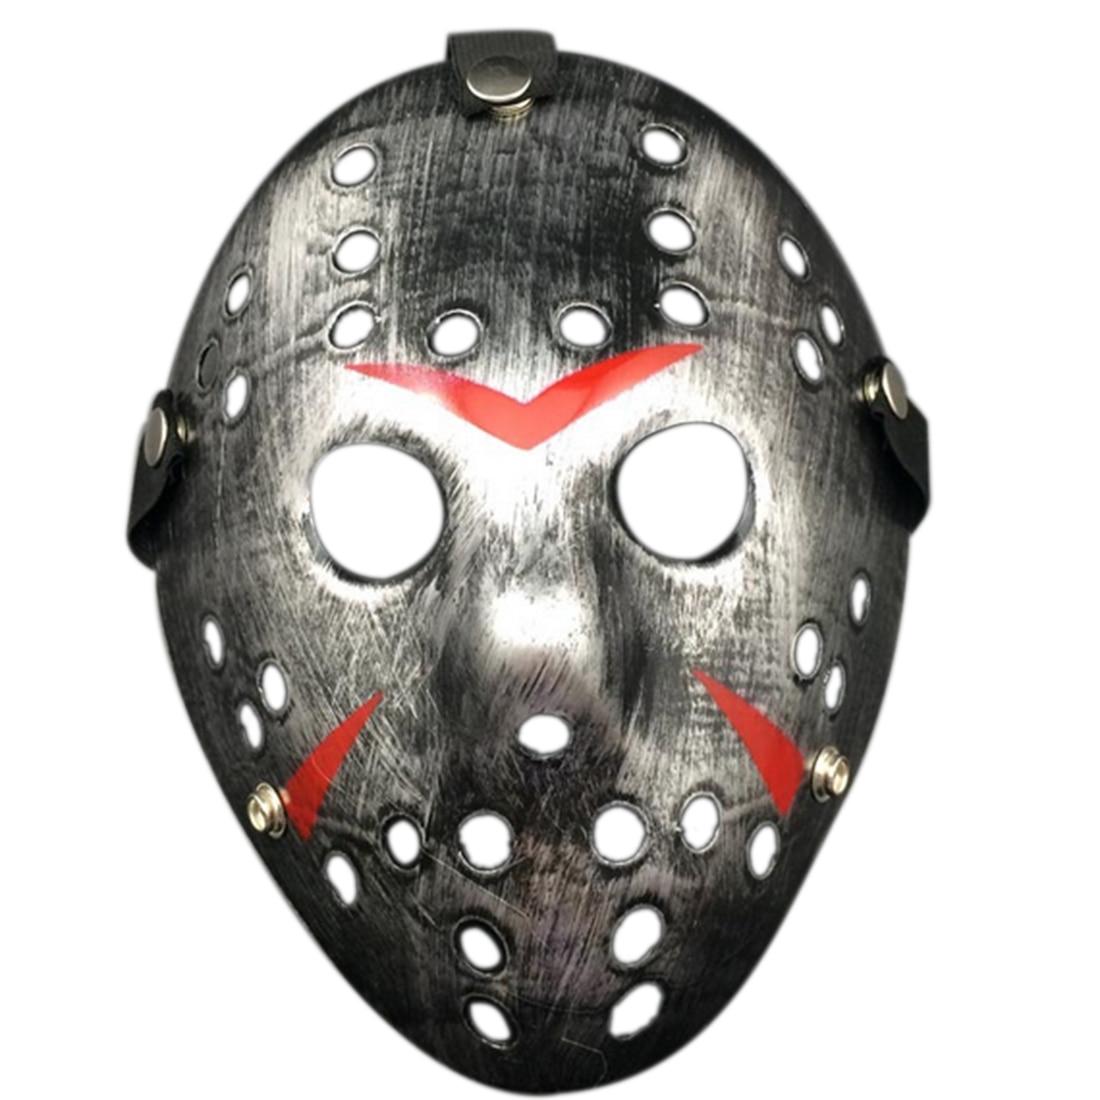 Online Get Cheap Retro Hockey Mask -Aliexpress.com | Alibaba Group